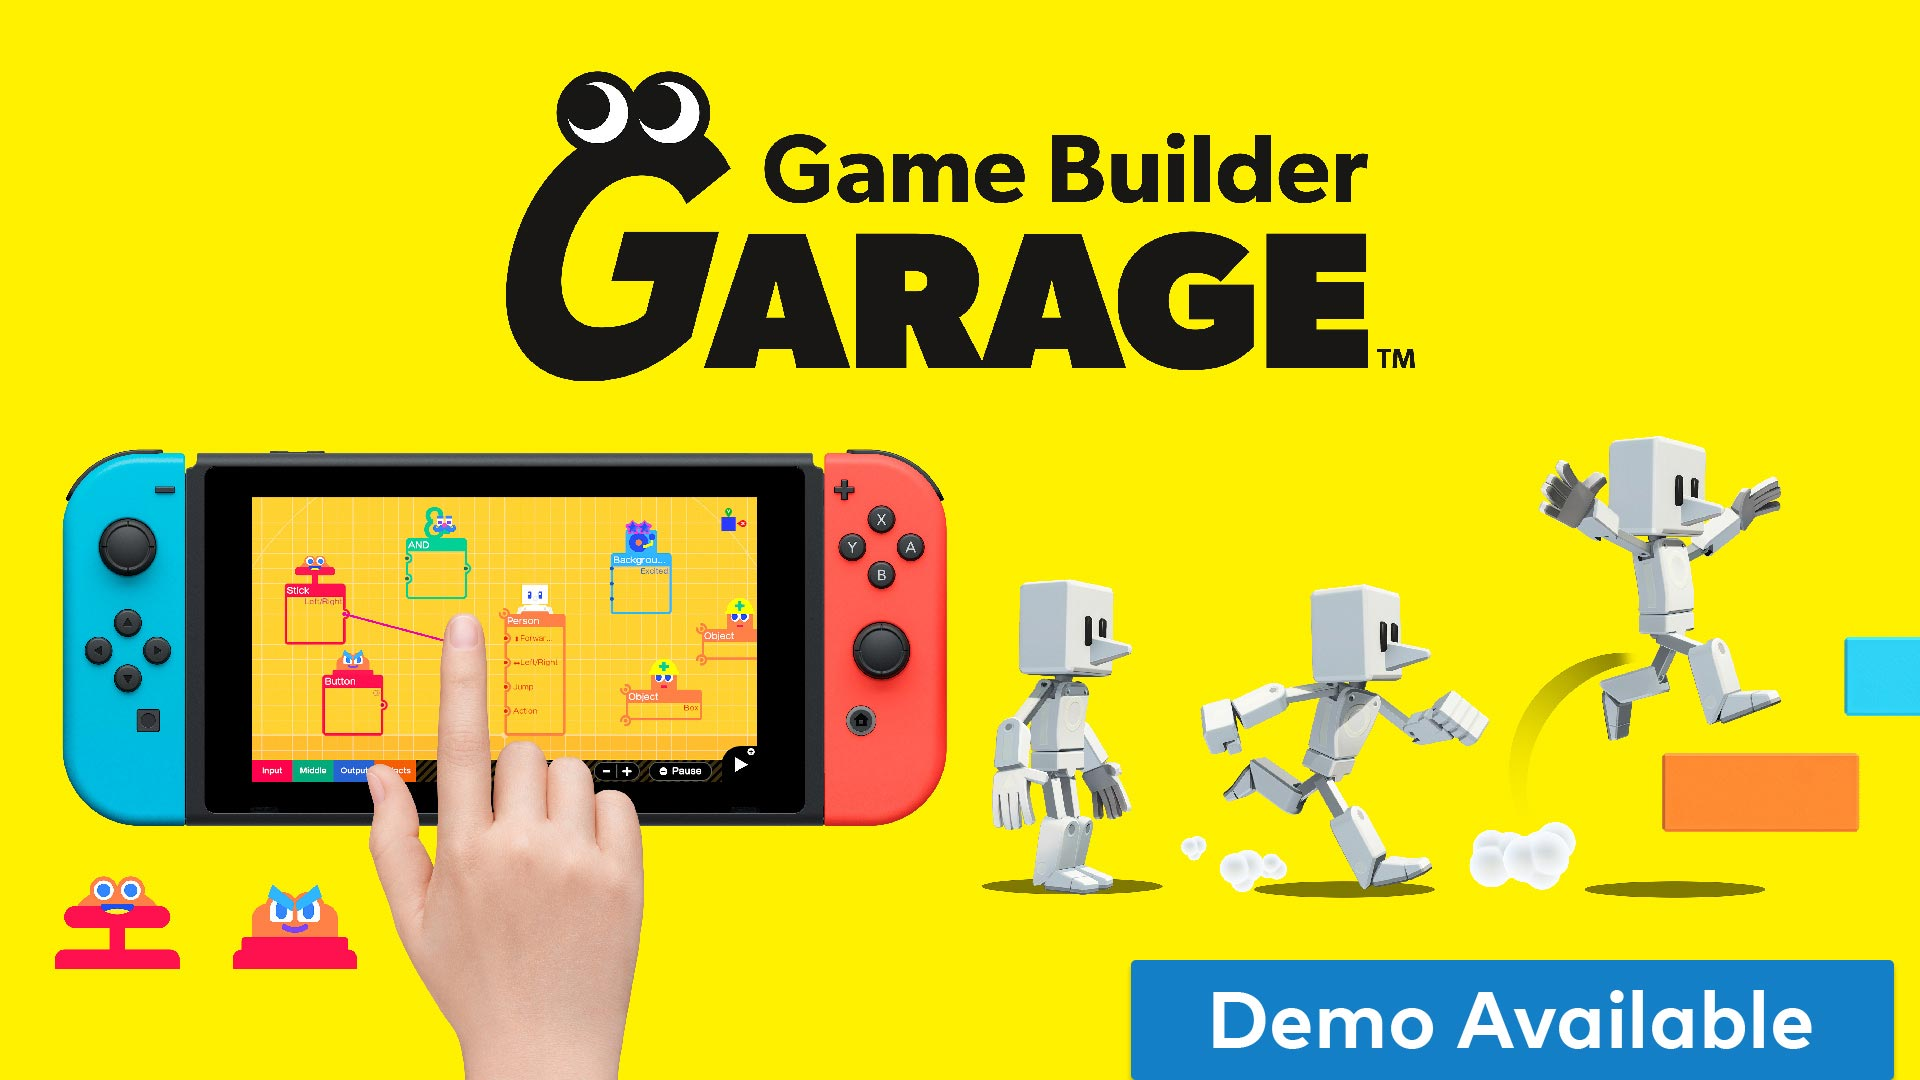 Game Builder Garage for Nintendo Switch - Nintendo Game Details